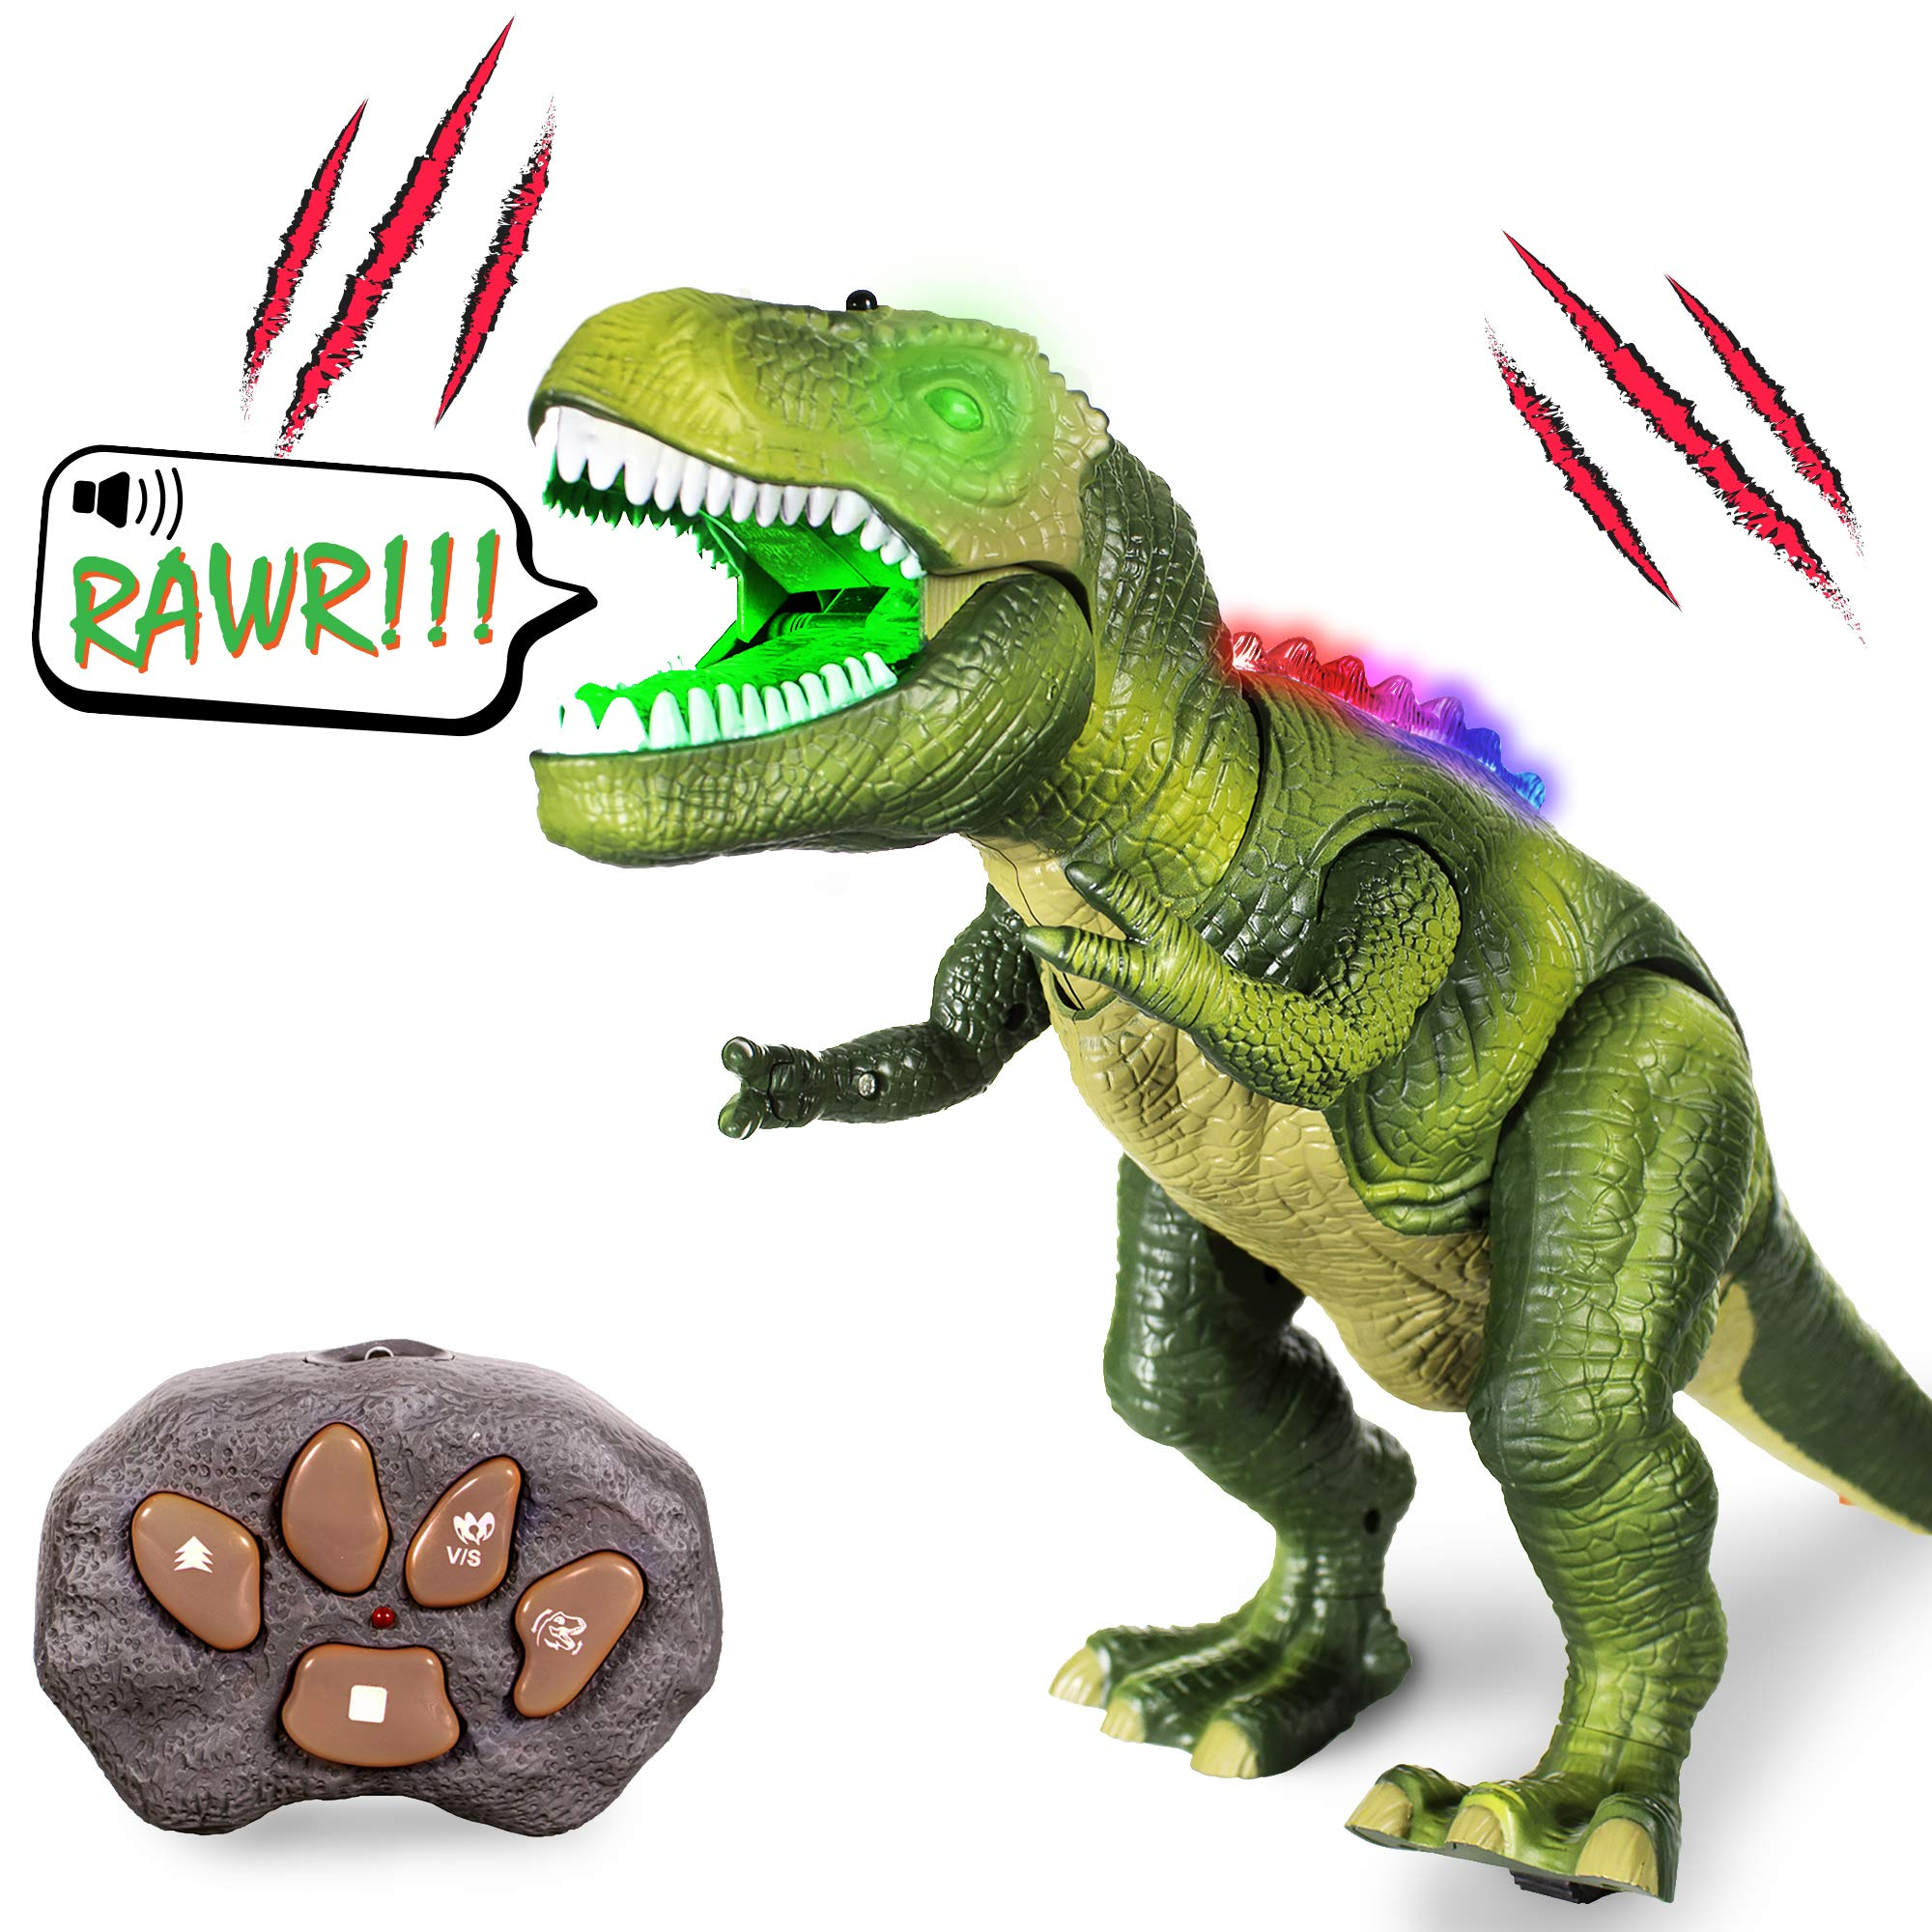 Windy City Novelties Led Light-Up Walking & Roaring T-Rex Dinosaur Toys for Boys & Girls (T-Rex with Remote) by Windy City Novelties (Image #1)